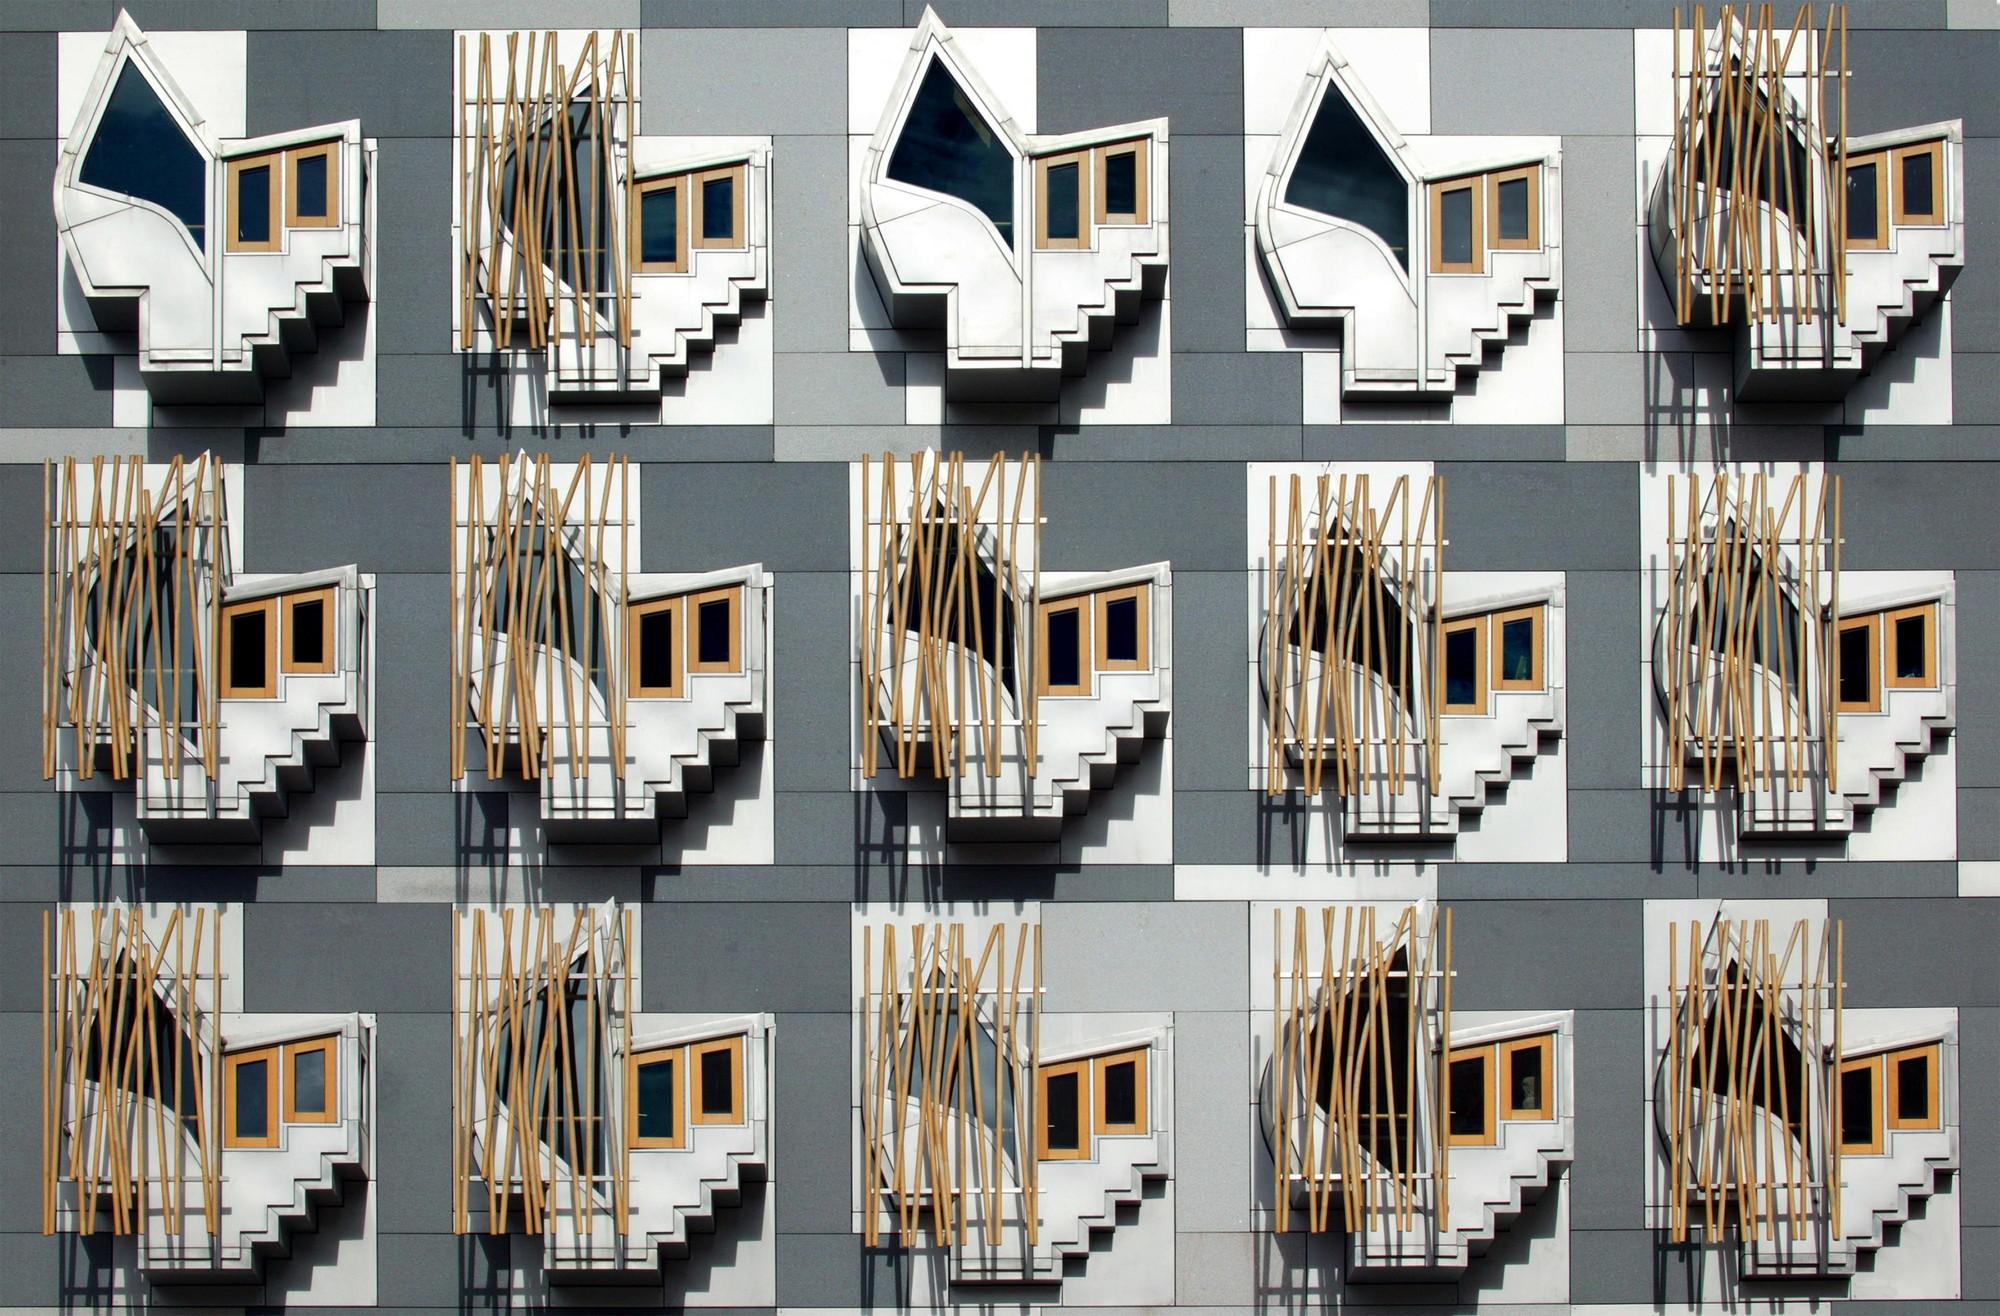 Enric Miralles' Scottish Parliament Building. Image Courtesy of University of Edinburgh